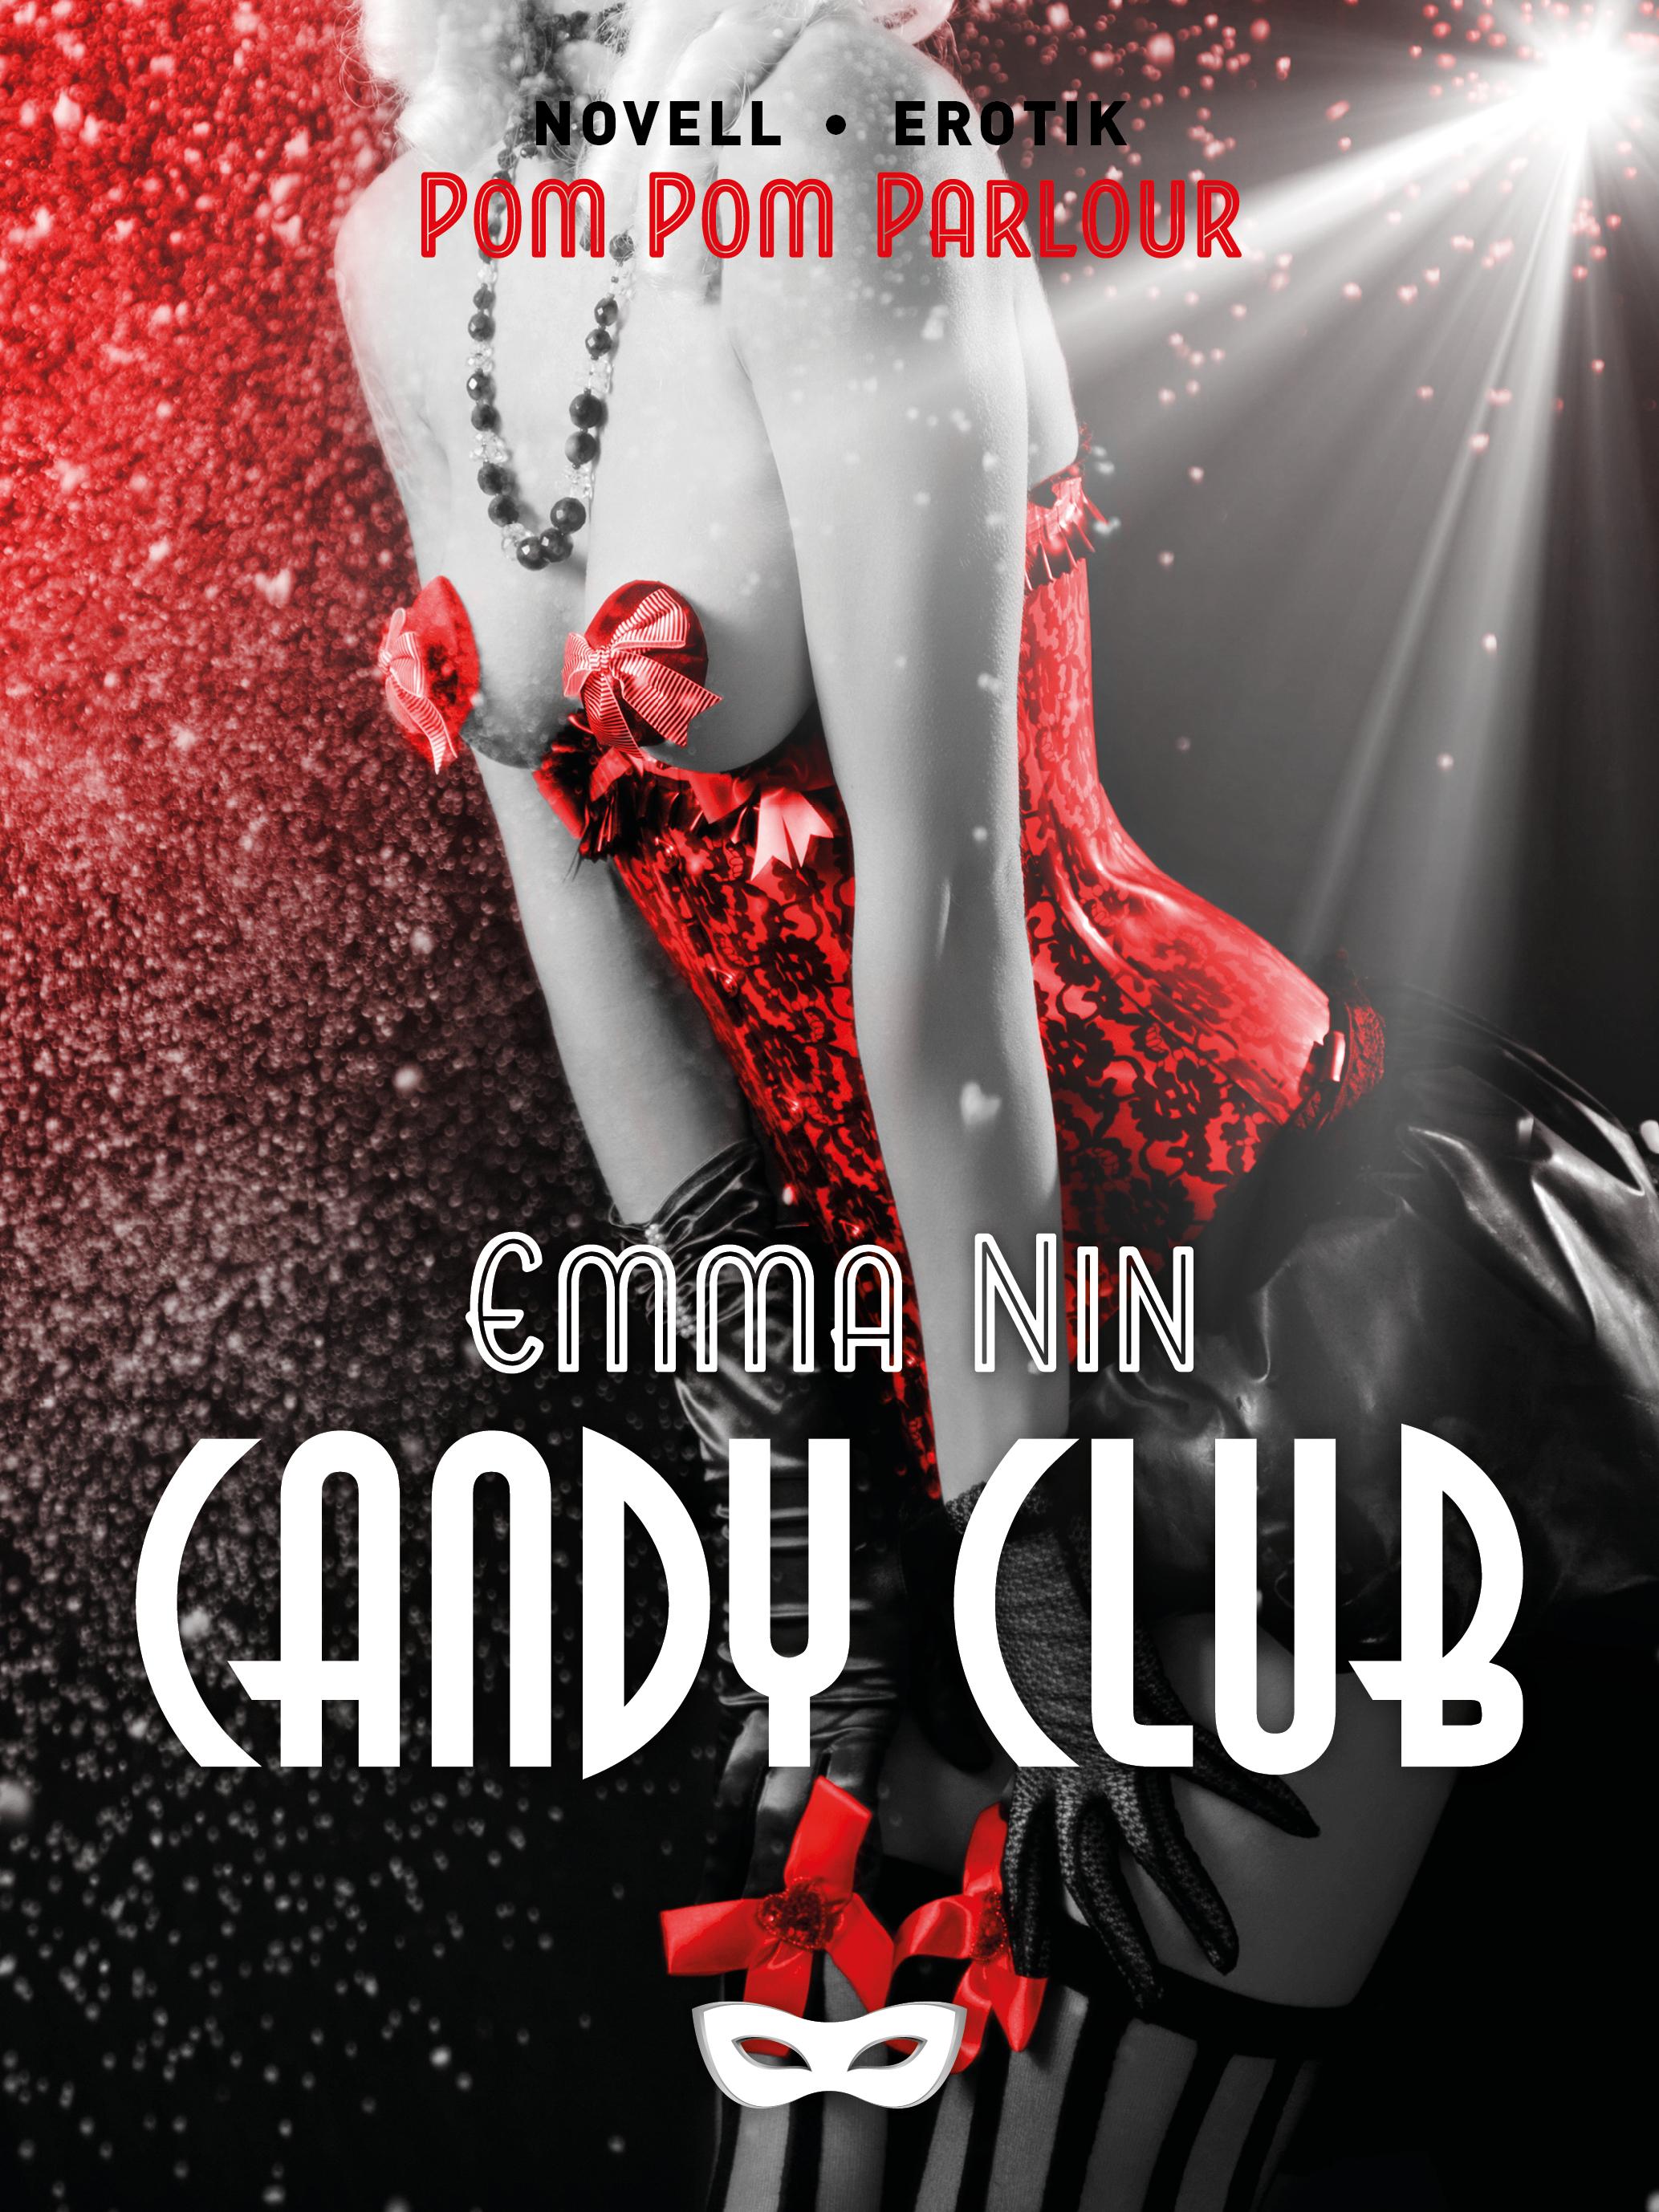 Candy club släpps 5 november